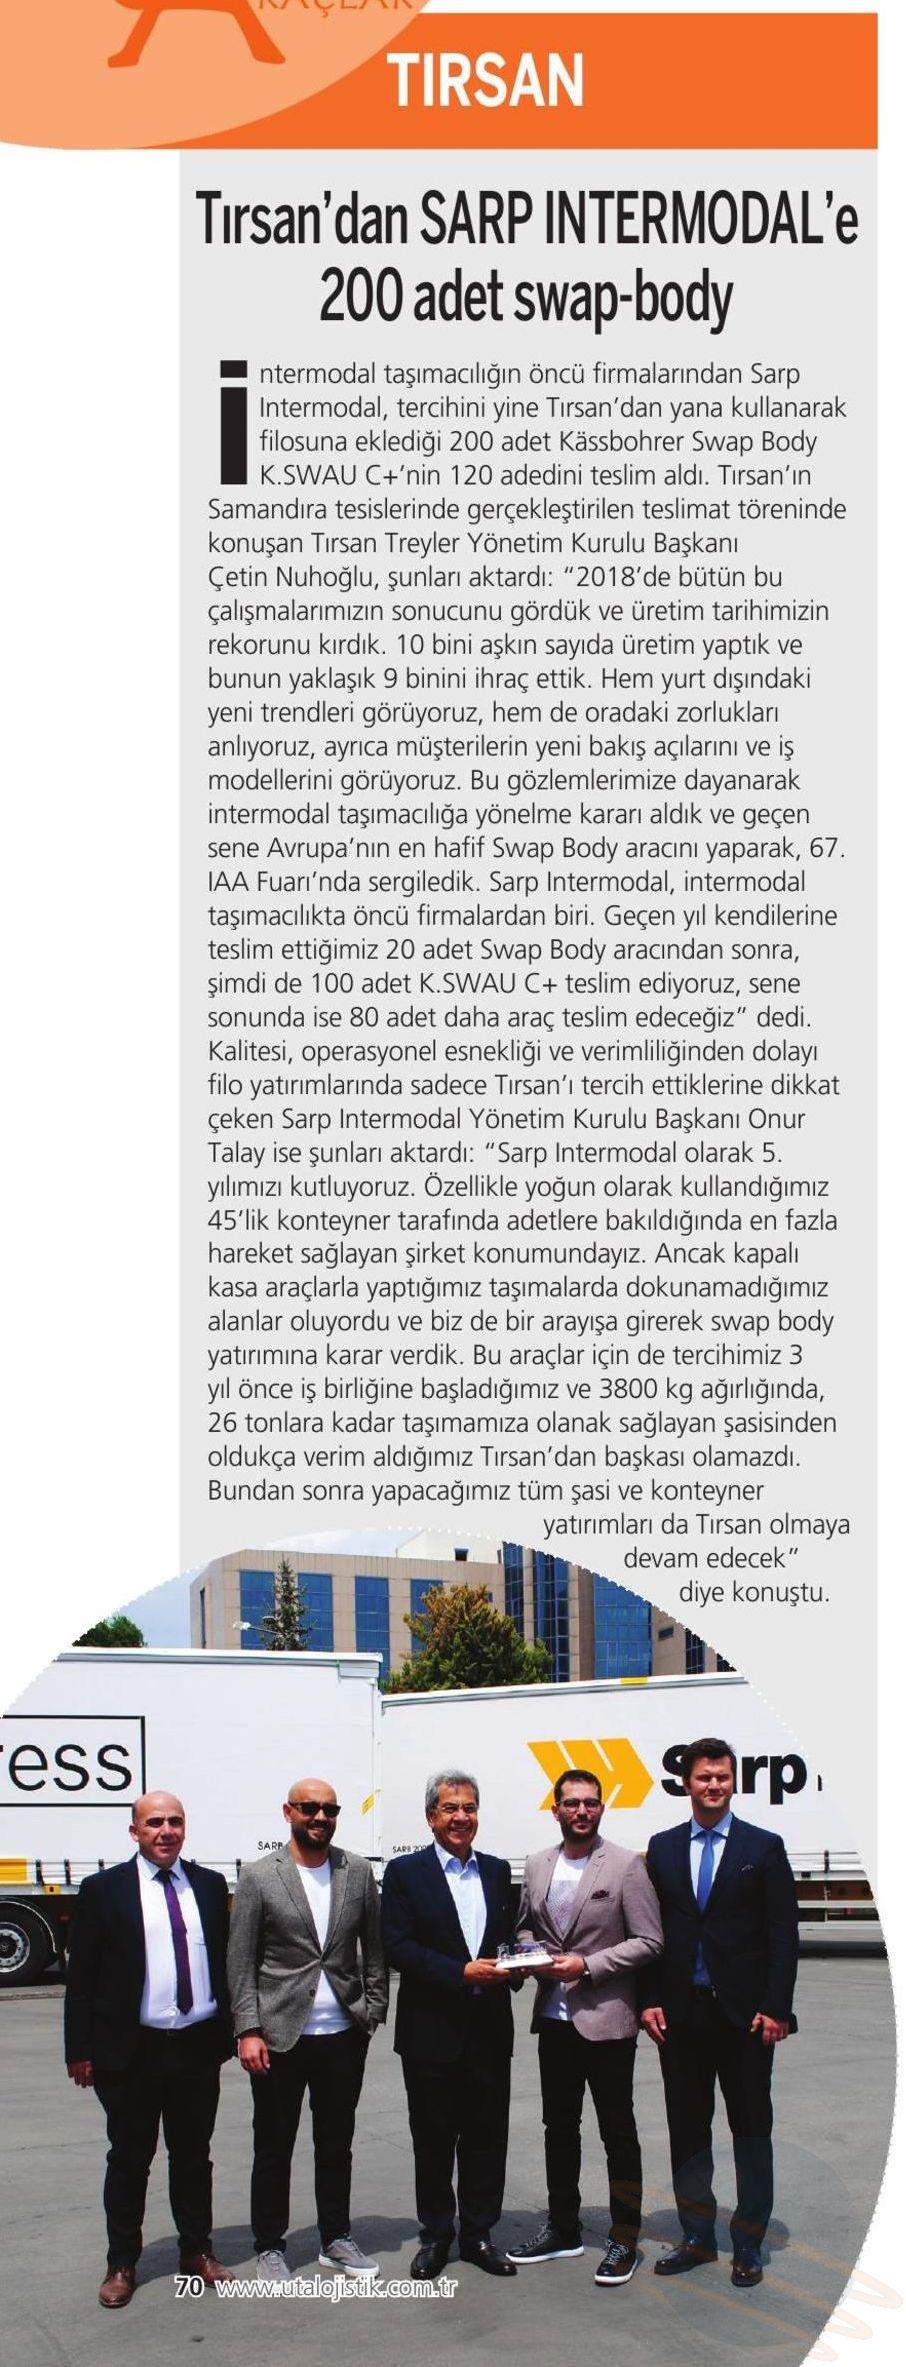 Tırsan'dan Sarp Intermodal'e 200 adet swap-body // UTA Lojistik